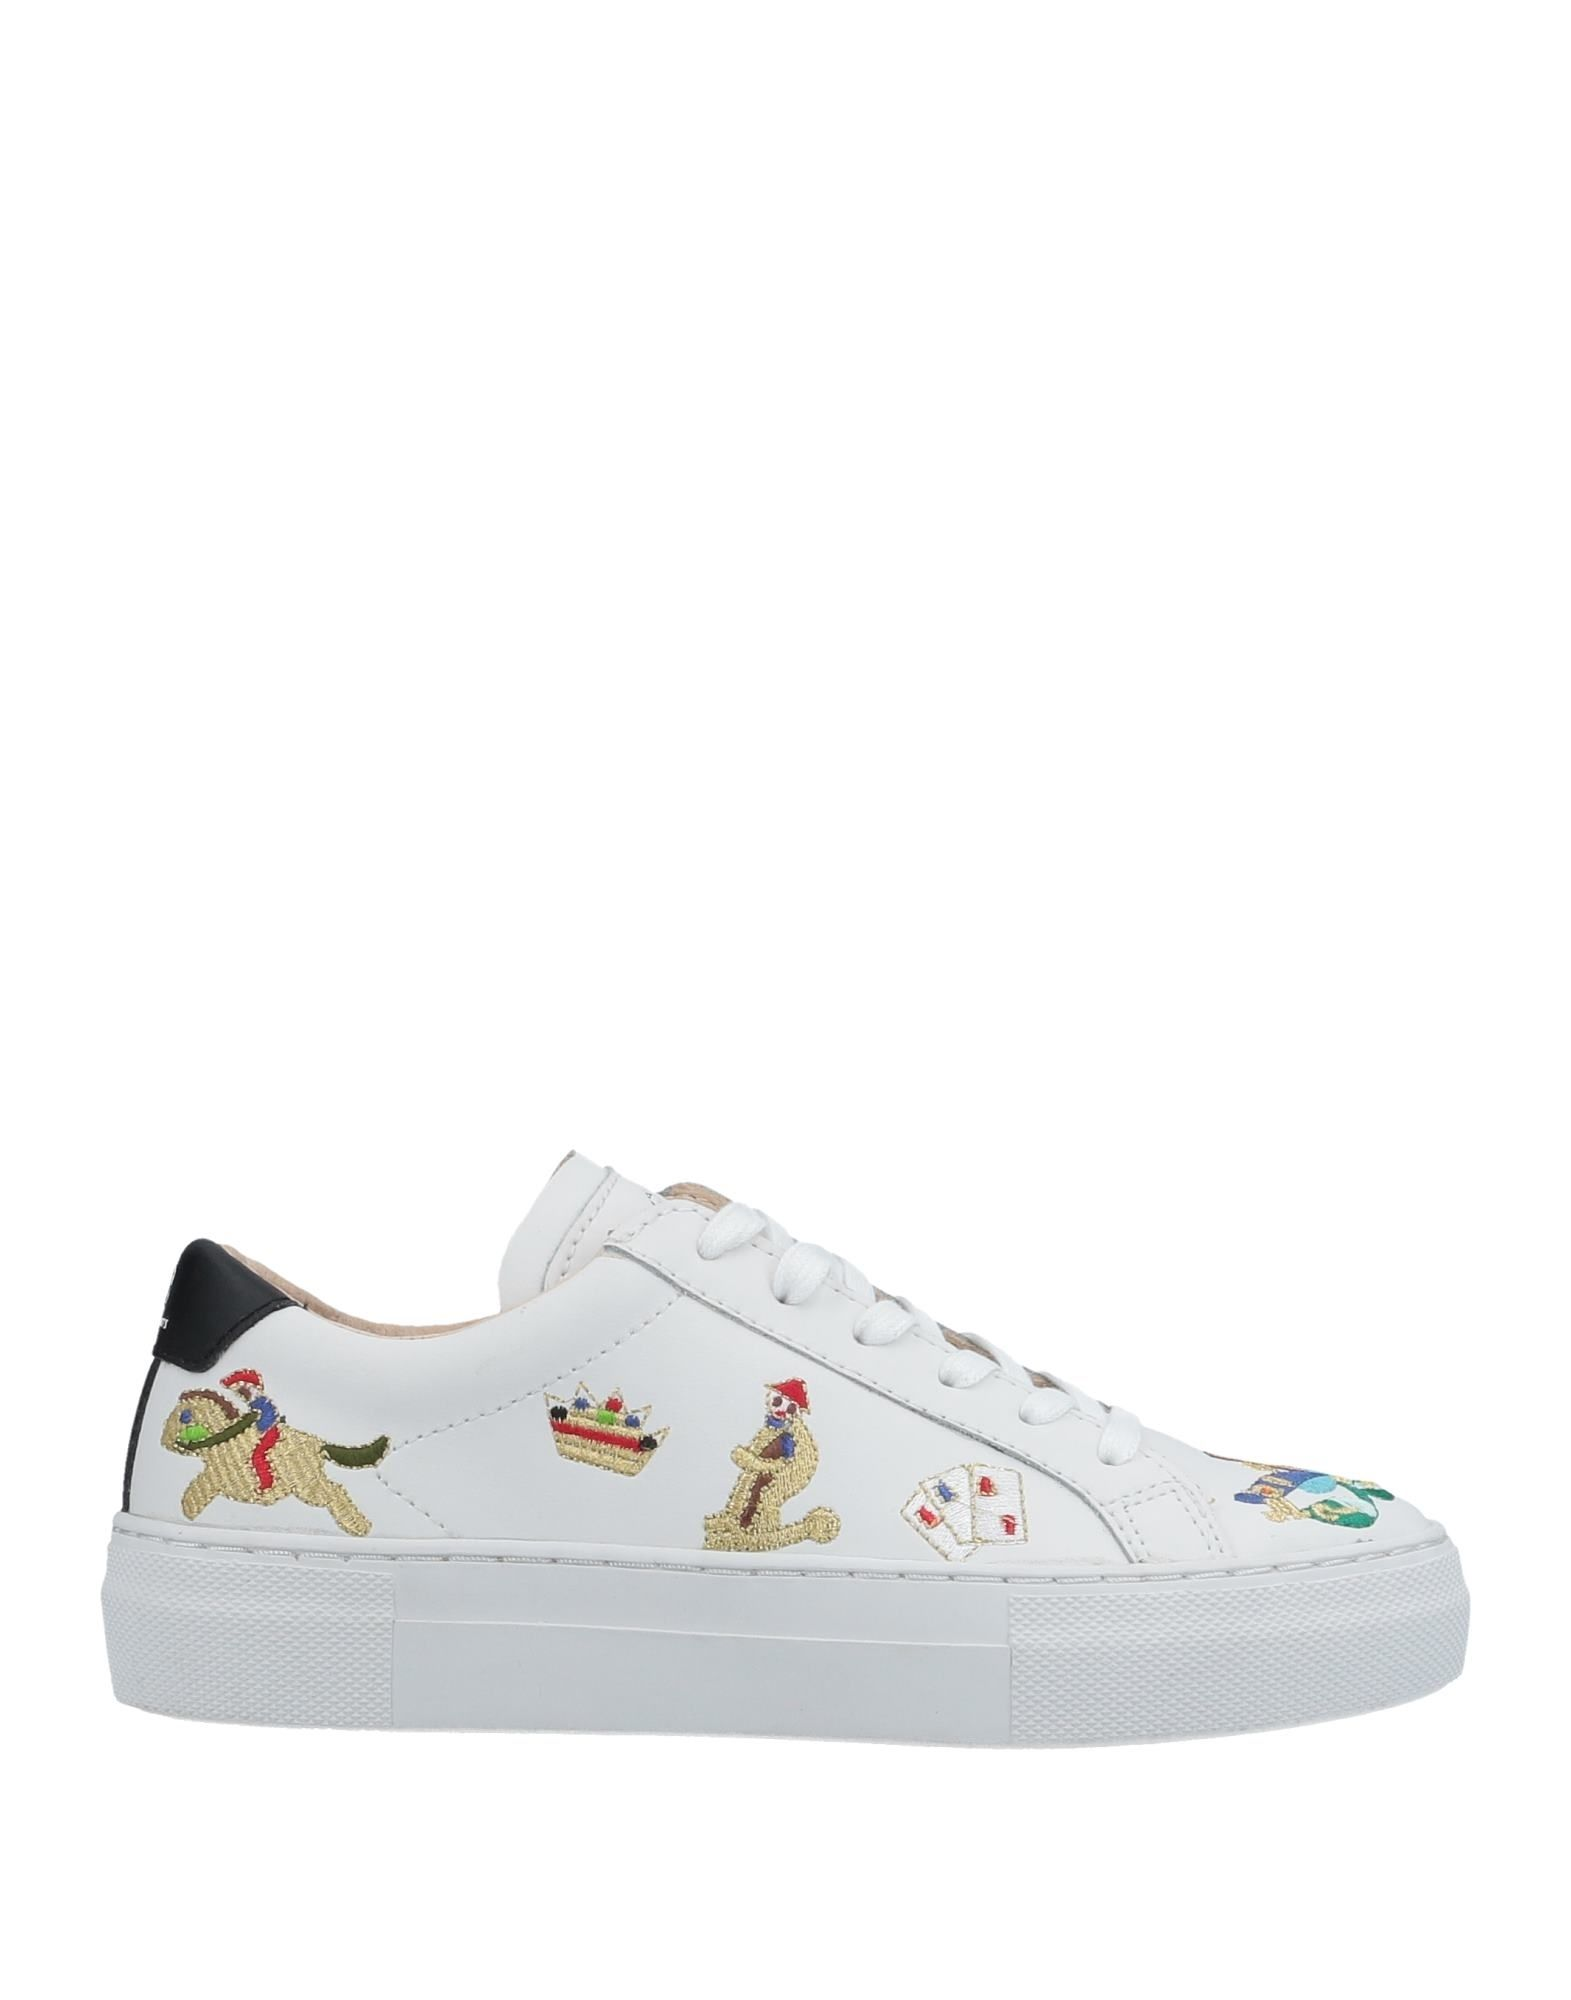 Stilvolle Of billige Schuhe Moa Master Of Stilvolle Arts Sneakers Damen  11509758XE 90a367